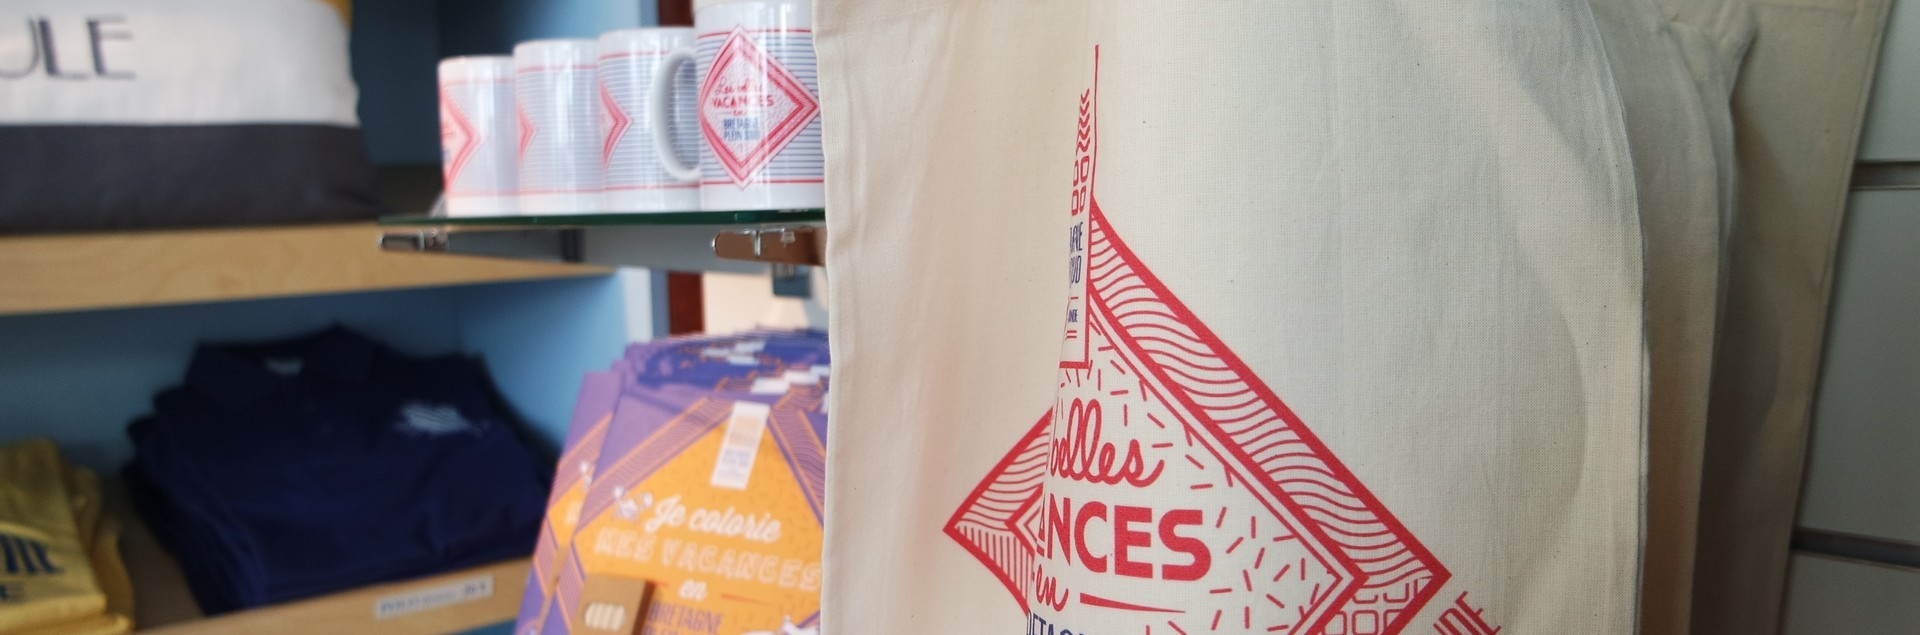 Mugs Bretagne Plein Sud - Boutique OT